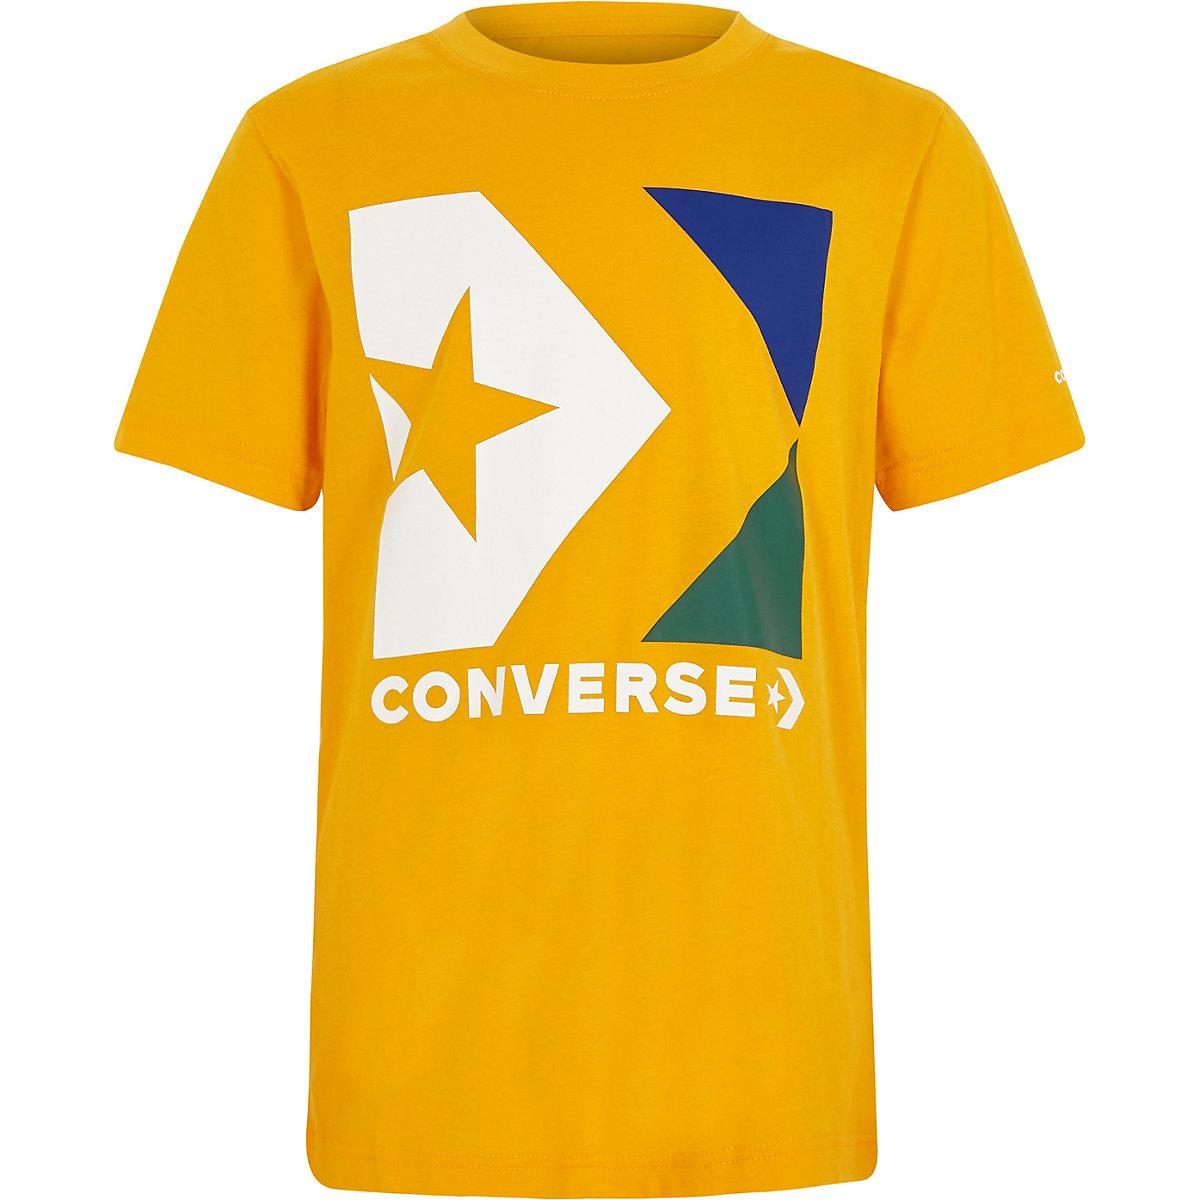 Boys Converse yellow logo T-shirt